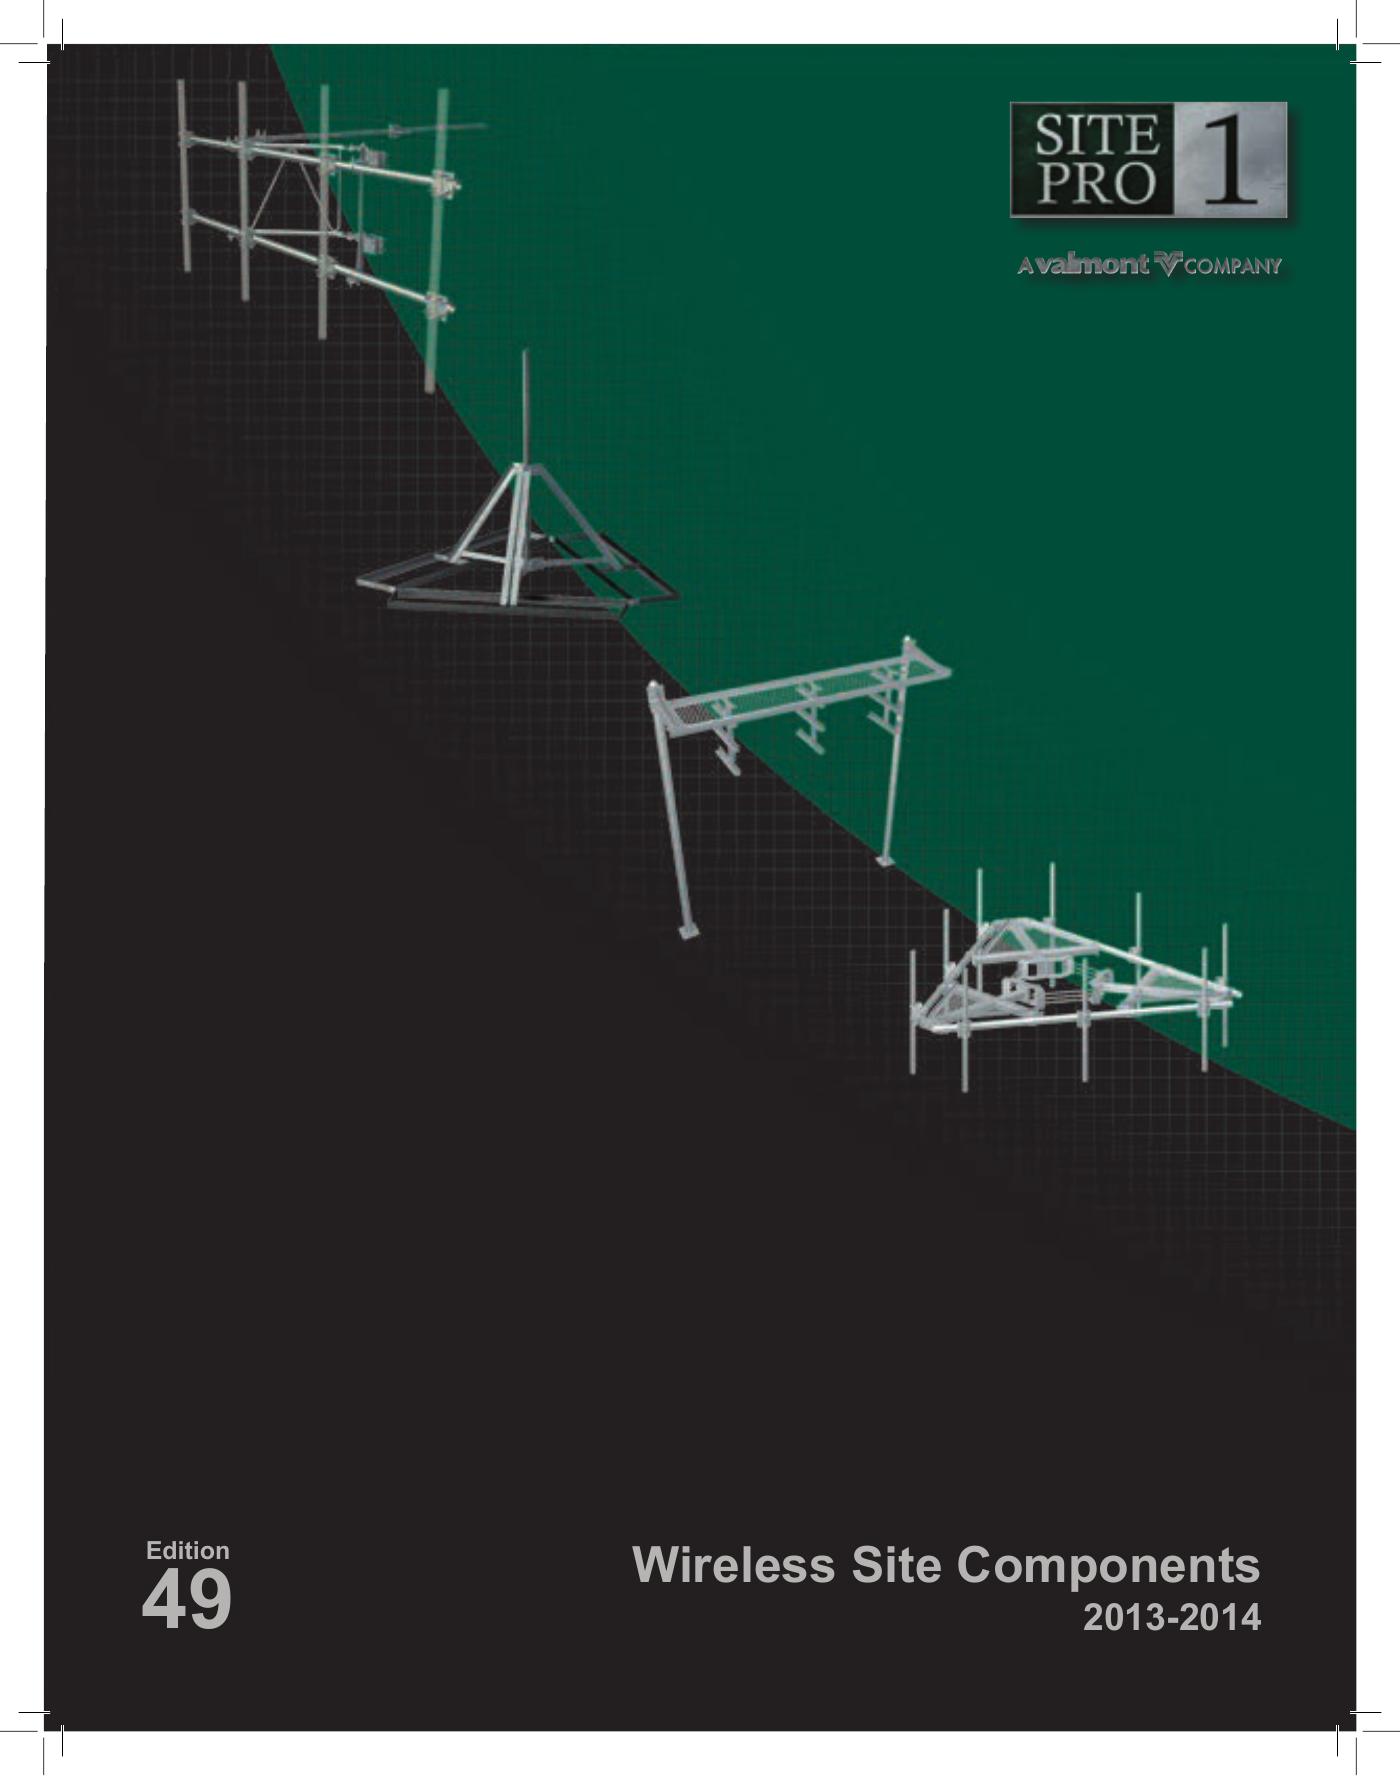 Wireless Site Components E550 Ford E 150 Wiring Diagram Manuals